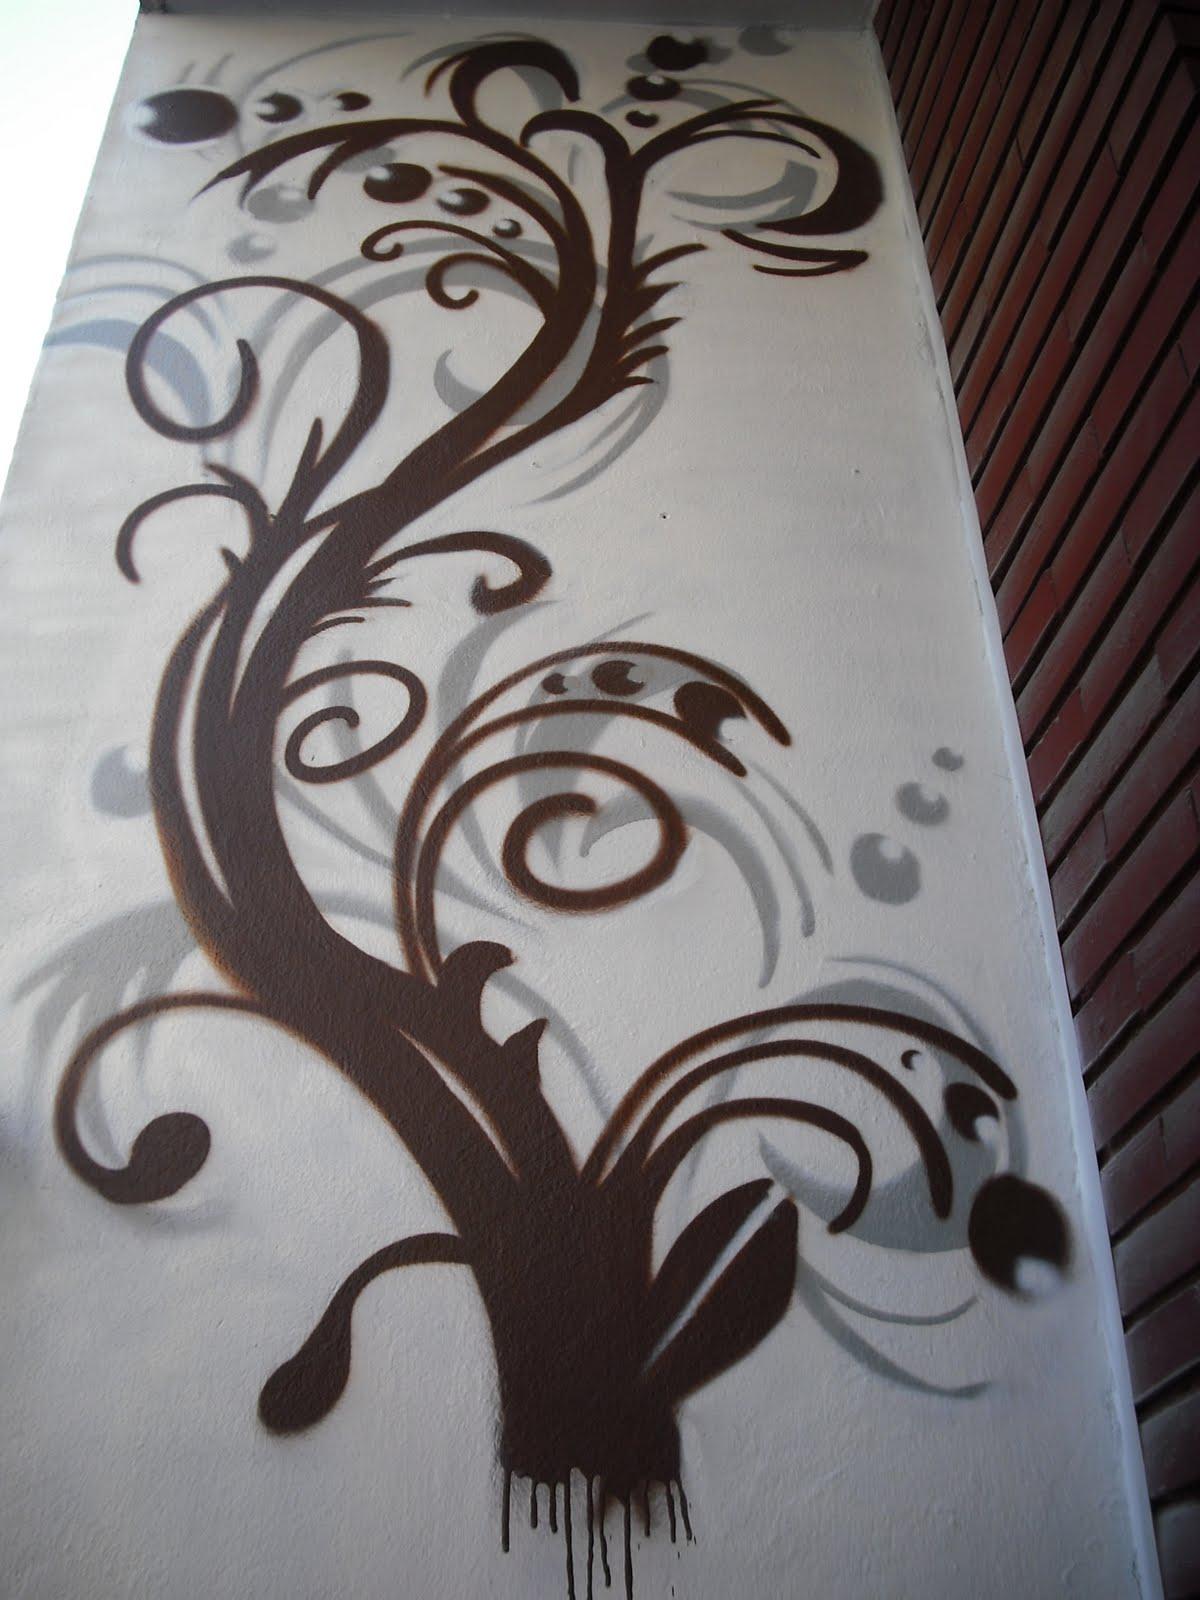 http://2.bp.blogspot.com/_MrKXC3uIRfw/S70vSjAkCoI/AAAAAAAAANw/u1ZCXpbdGn4/s1600/Imagen+001.jpg